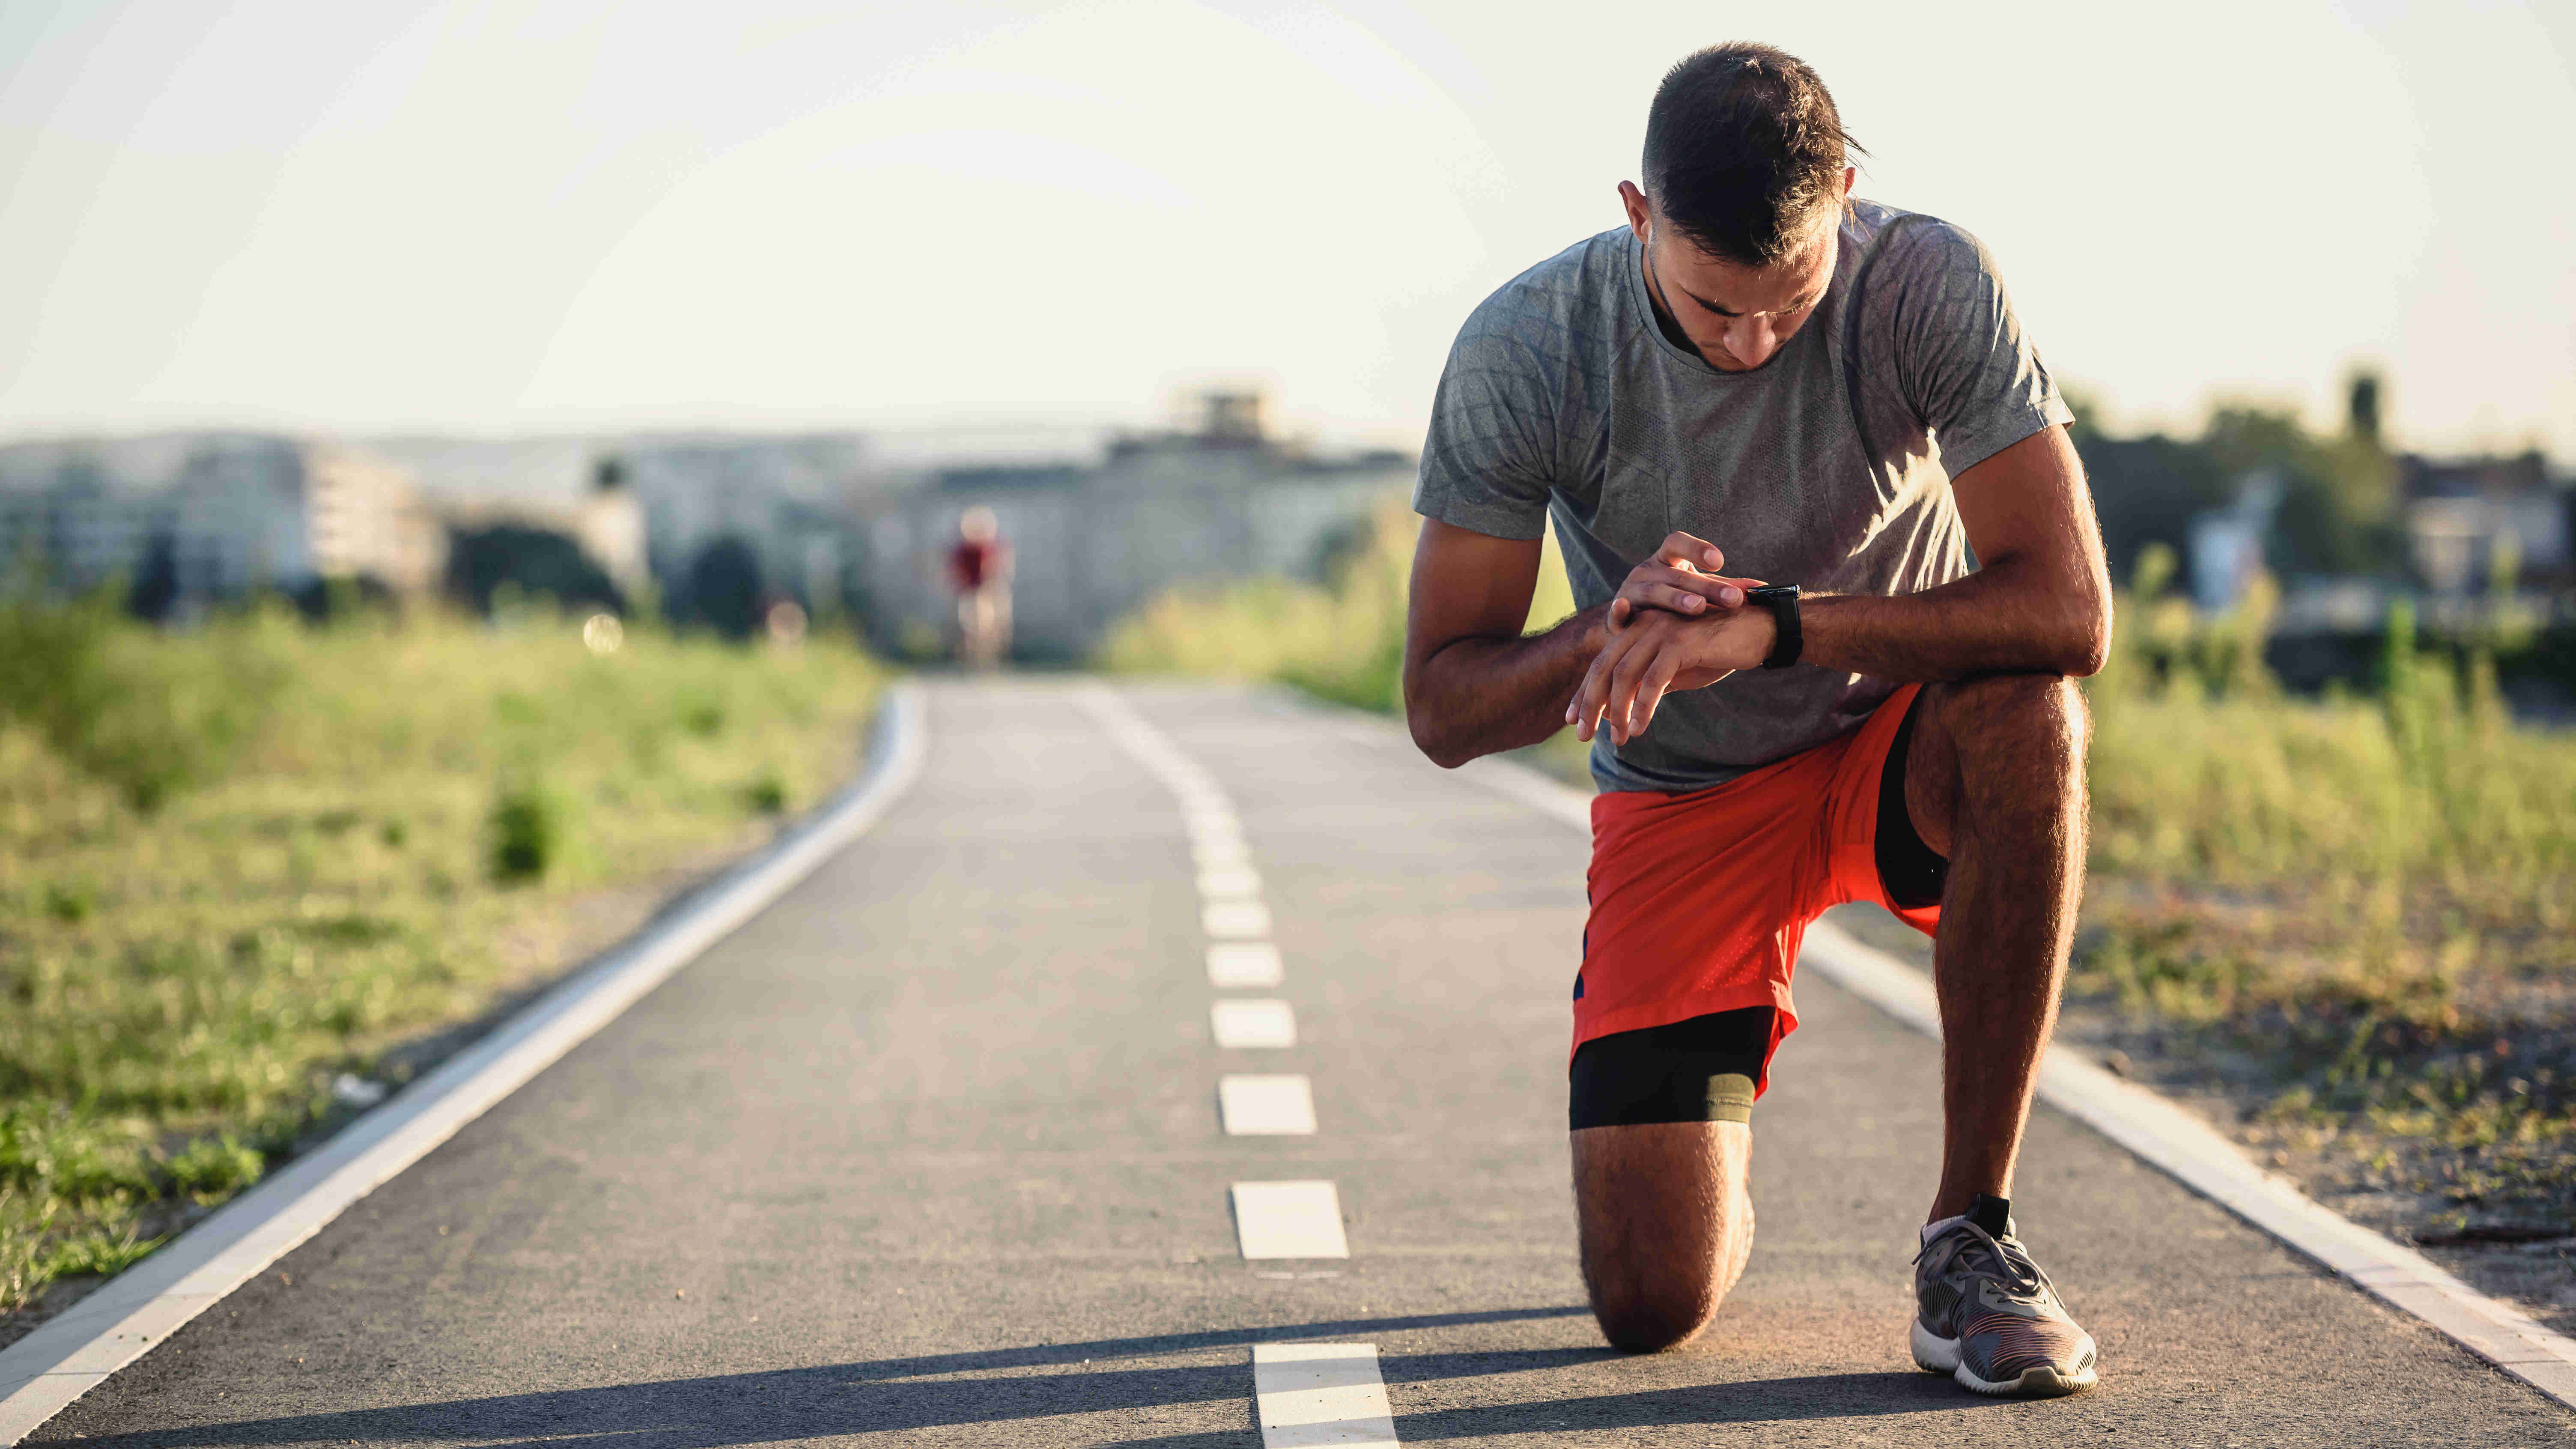 Fitness, Gesundheit, Apple Watch, Sport Urheberrechte: Adobe Stock / Lordn